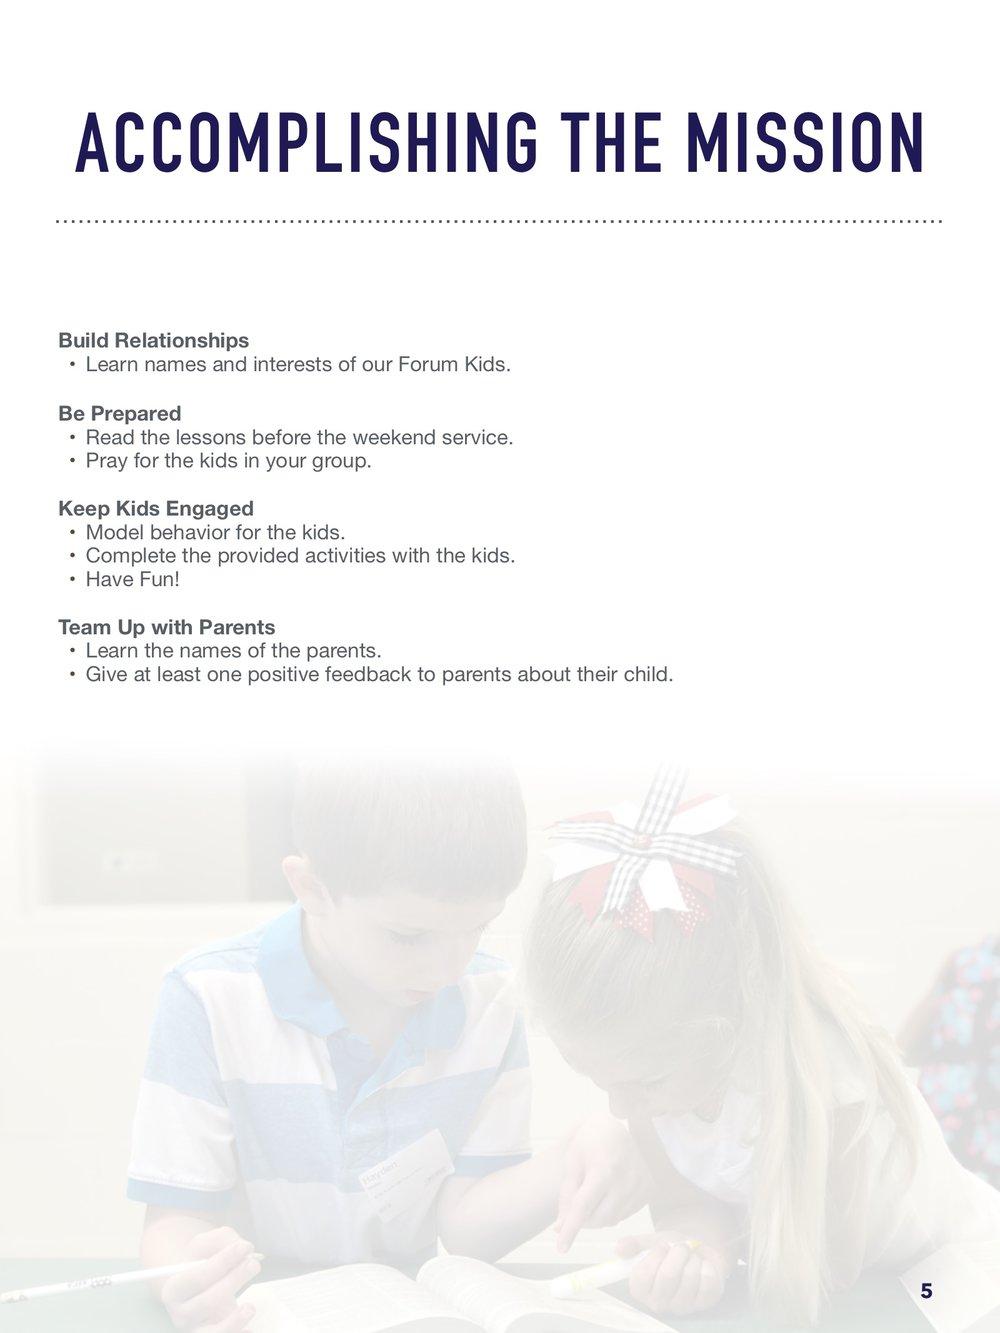 Forum Kids Policy Manual 5.jpg